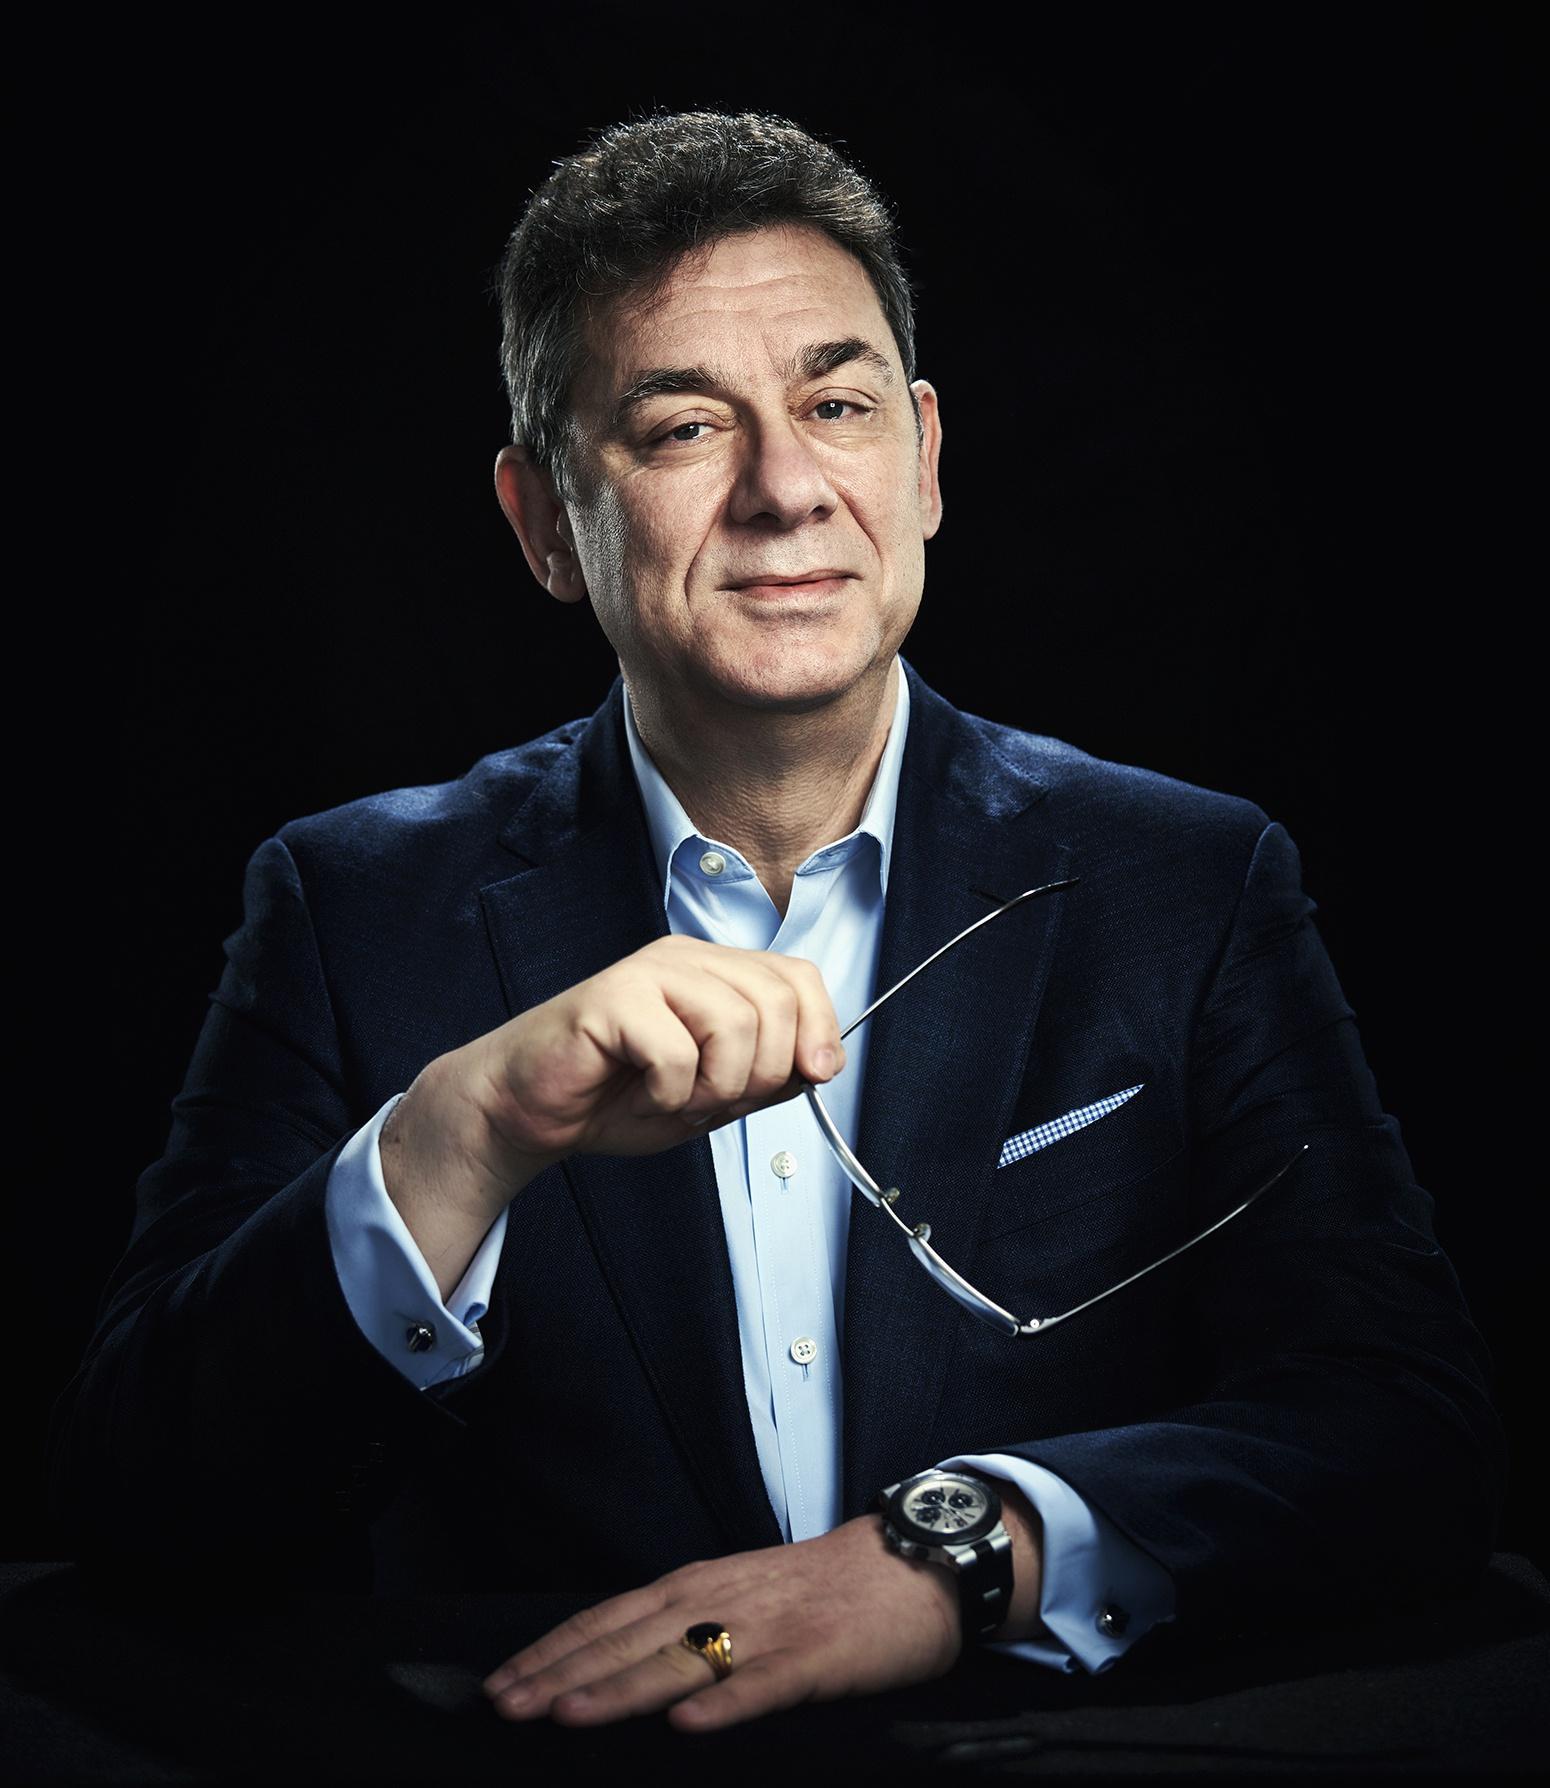 Albert Bourla, CEO of Pfizer